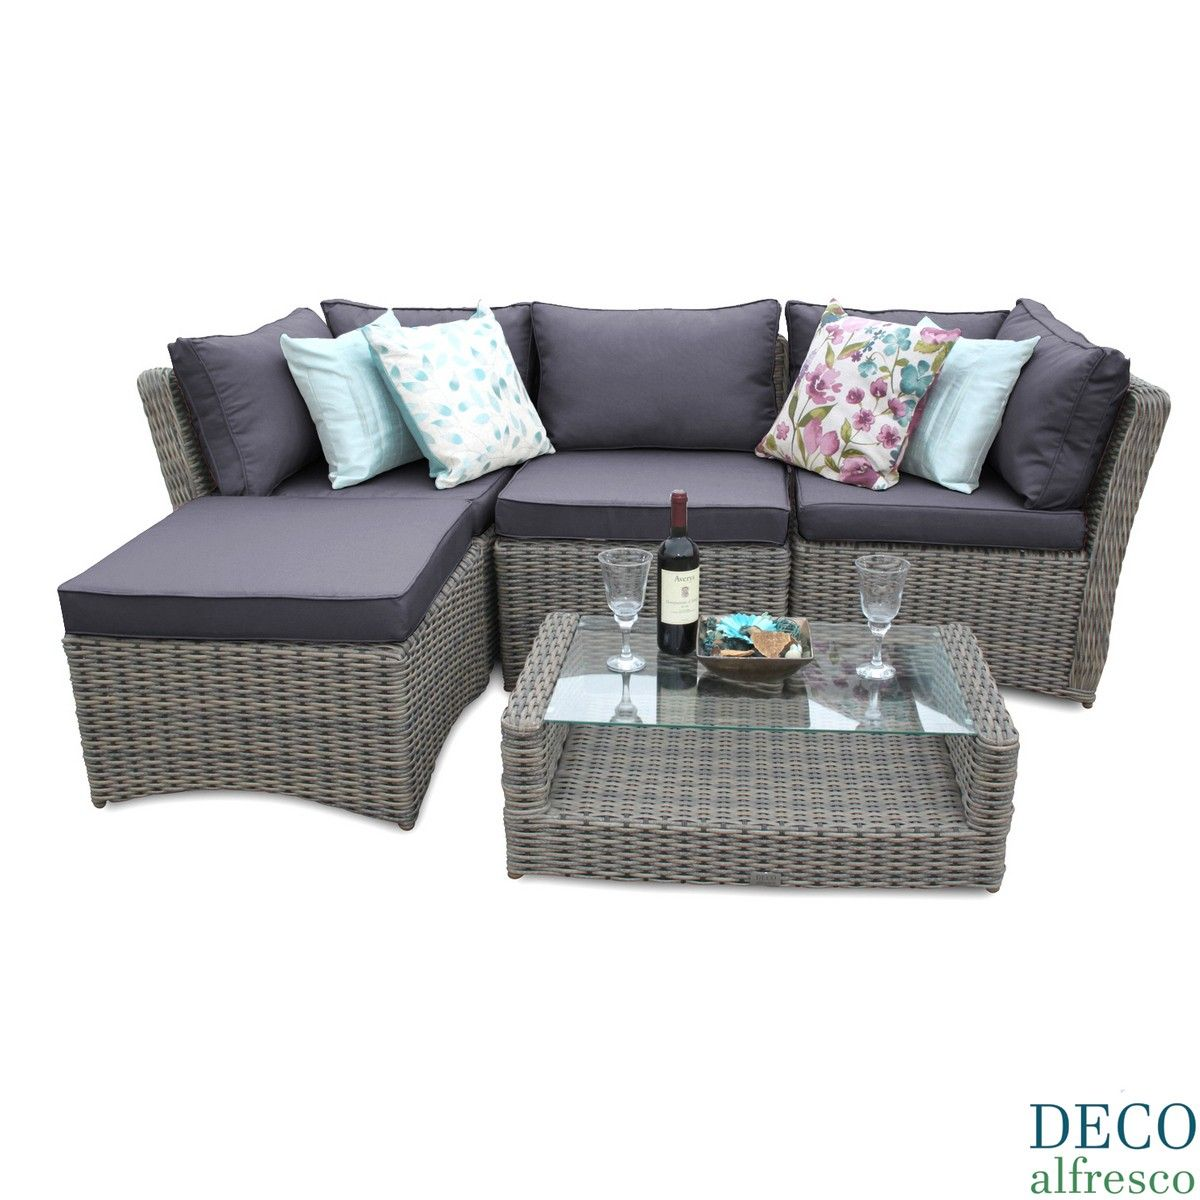 Fine 5Pc High Back Modular Corner Sofa Rattan Furniture Set Caraccident5 Cool Chair Designs And Ideas Caraccident5Info